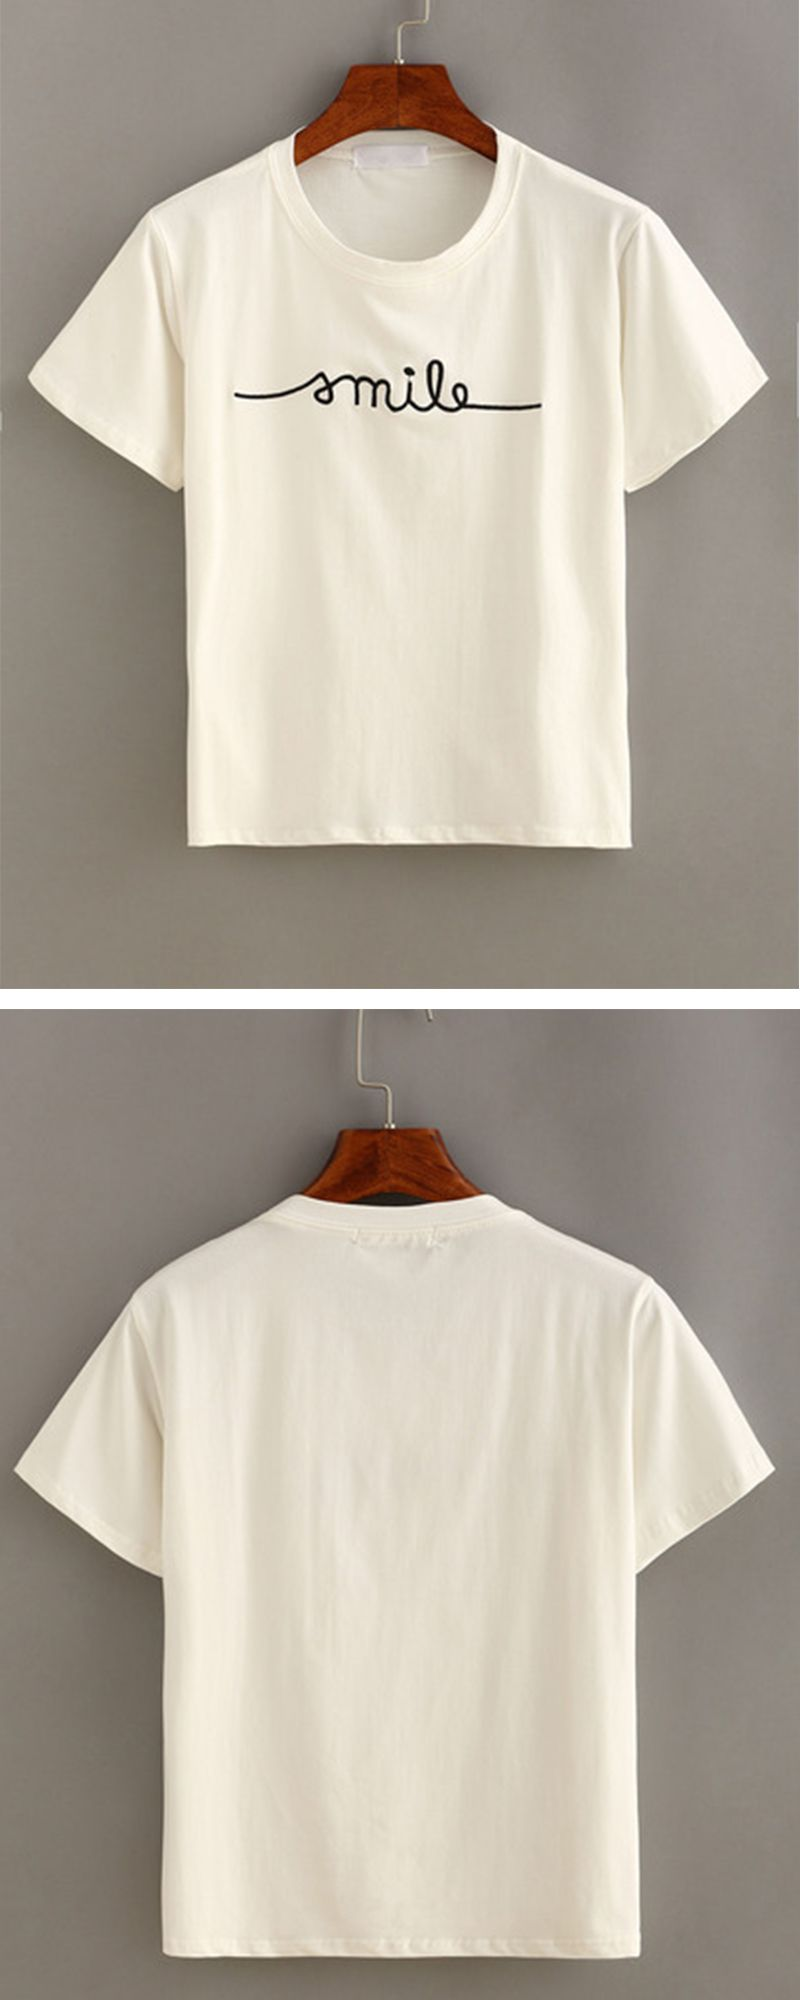 a1f370fac Letter Embroidered Short Sleeve T-shirt | Pinterest Closet ...